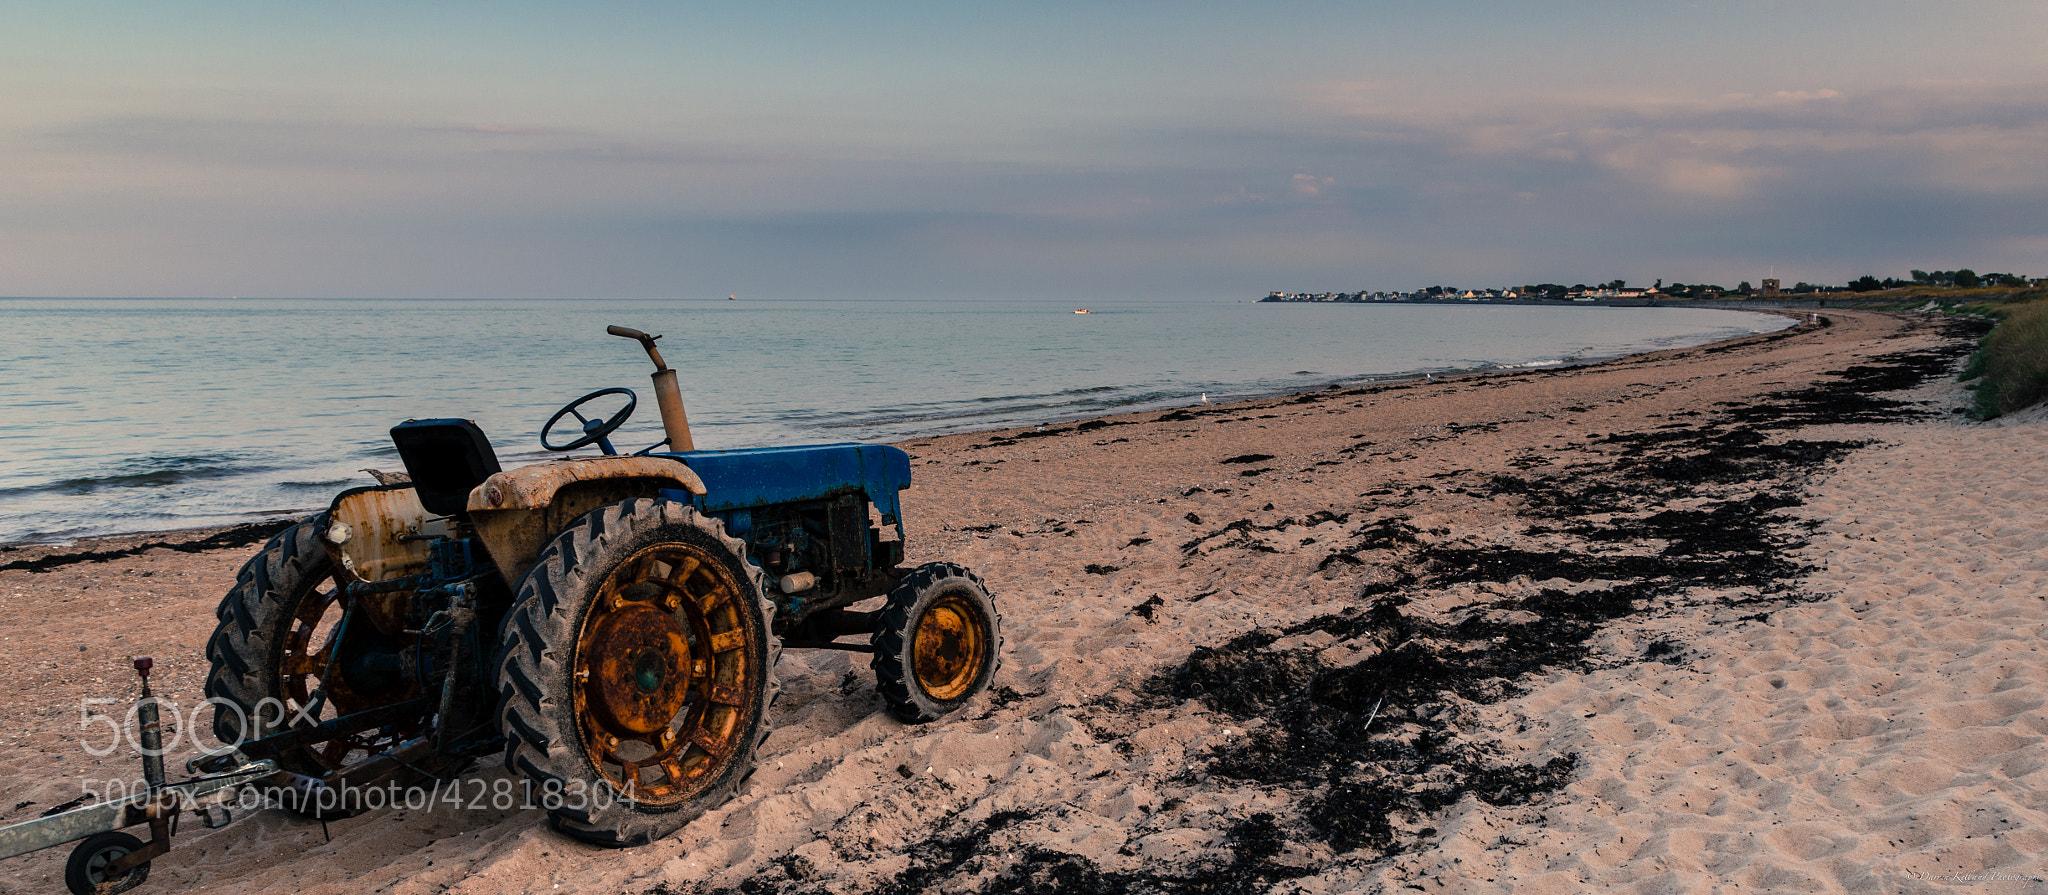 Photograph Evening drive by Darren Kelland on 500px